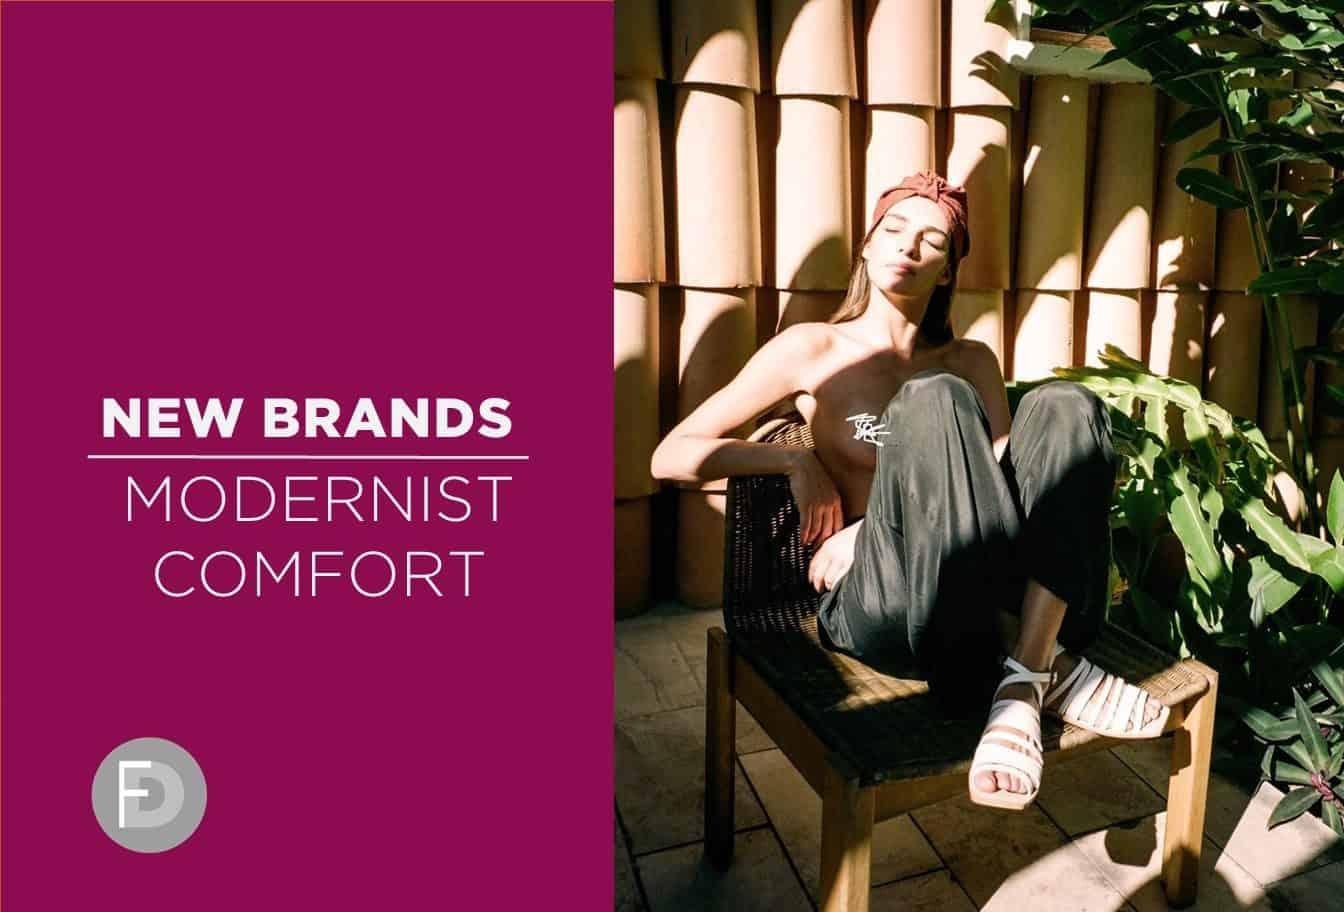 Modern Comfort Brands